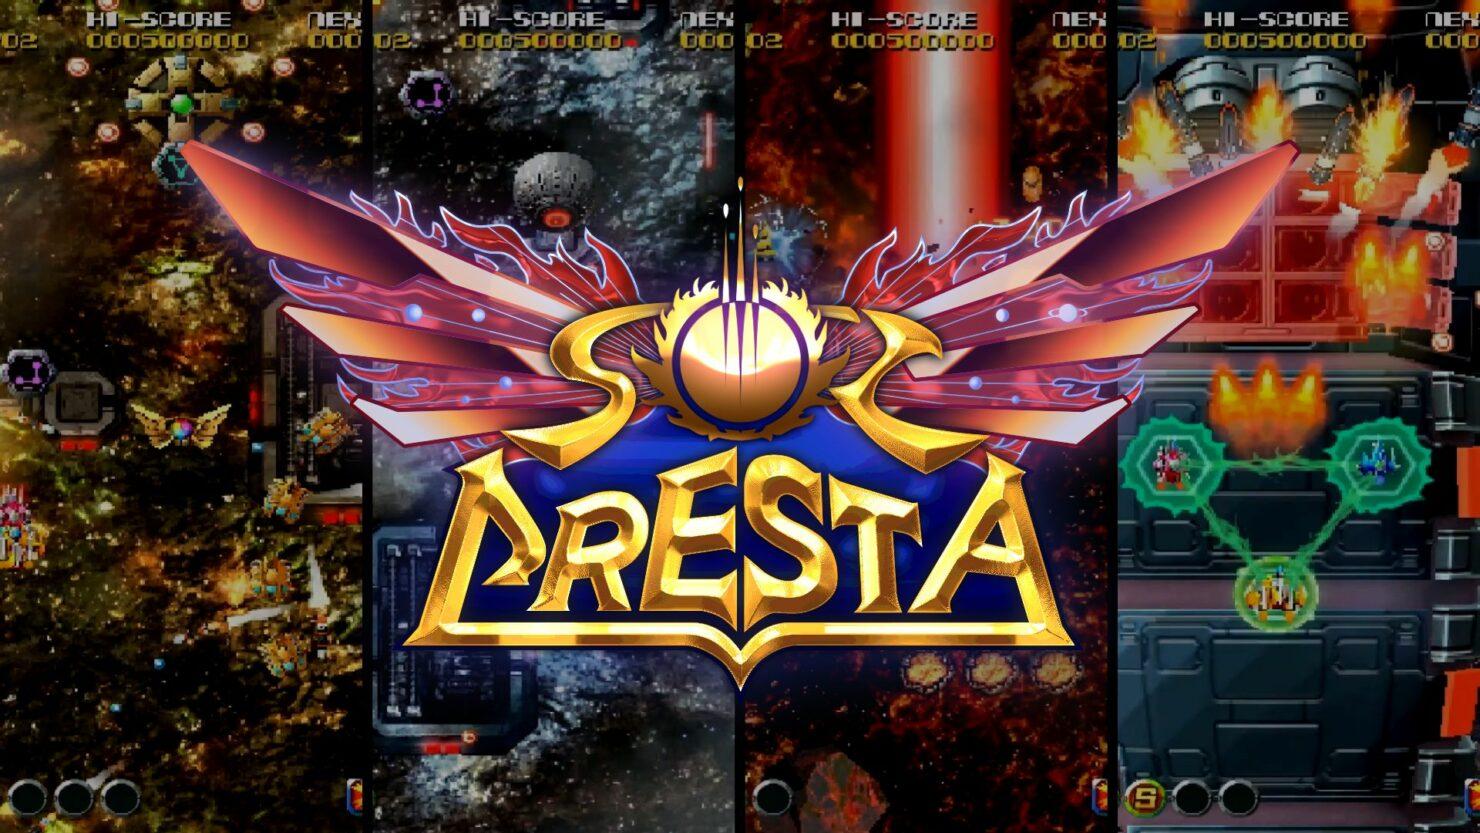 Sol Cresta PlatinumGames